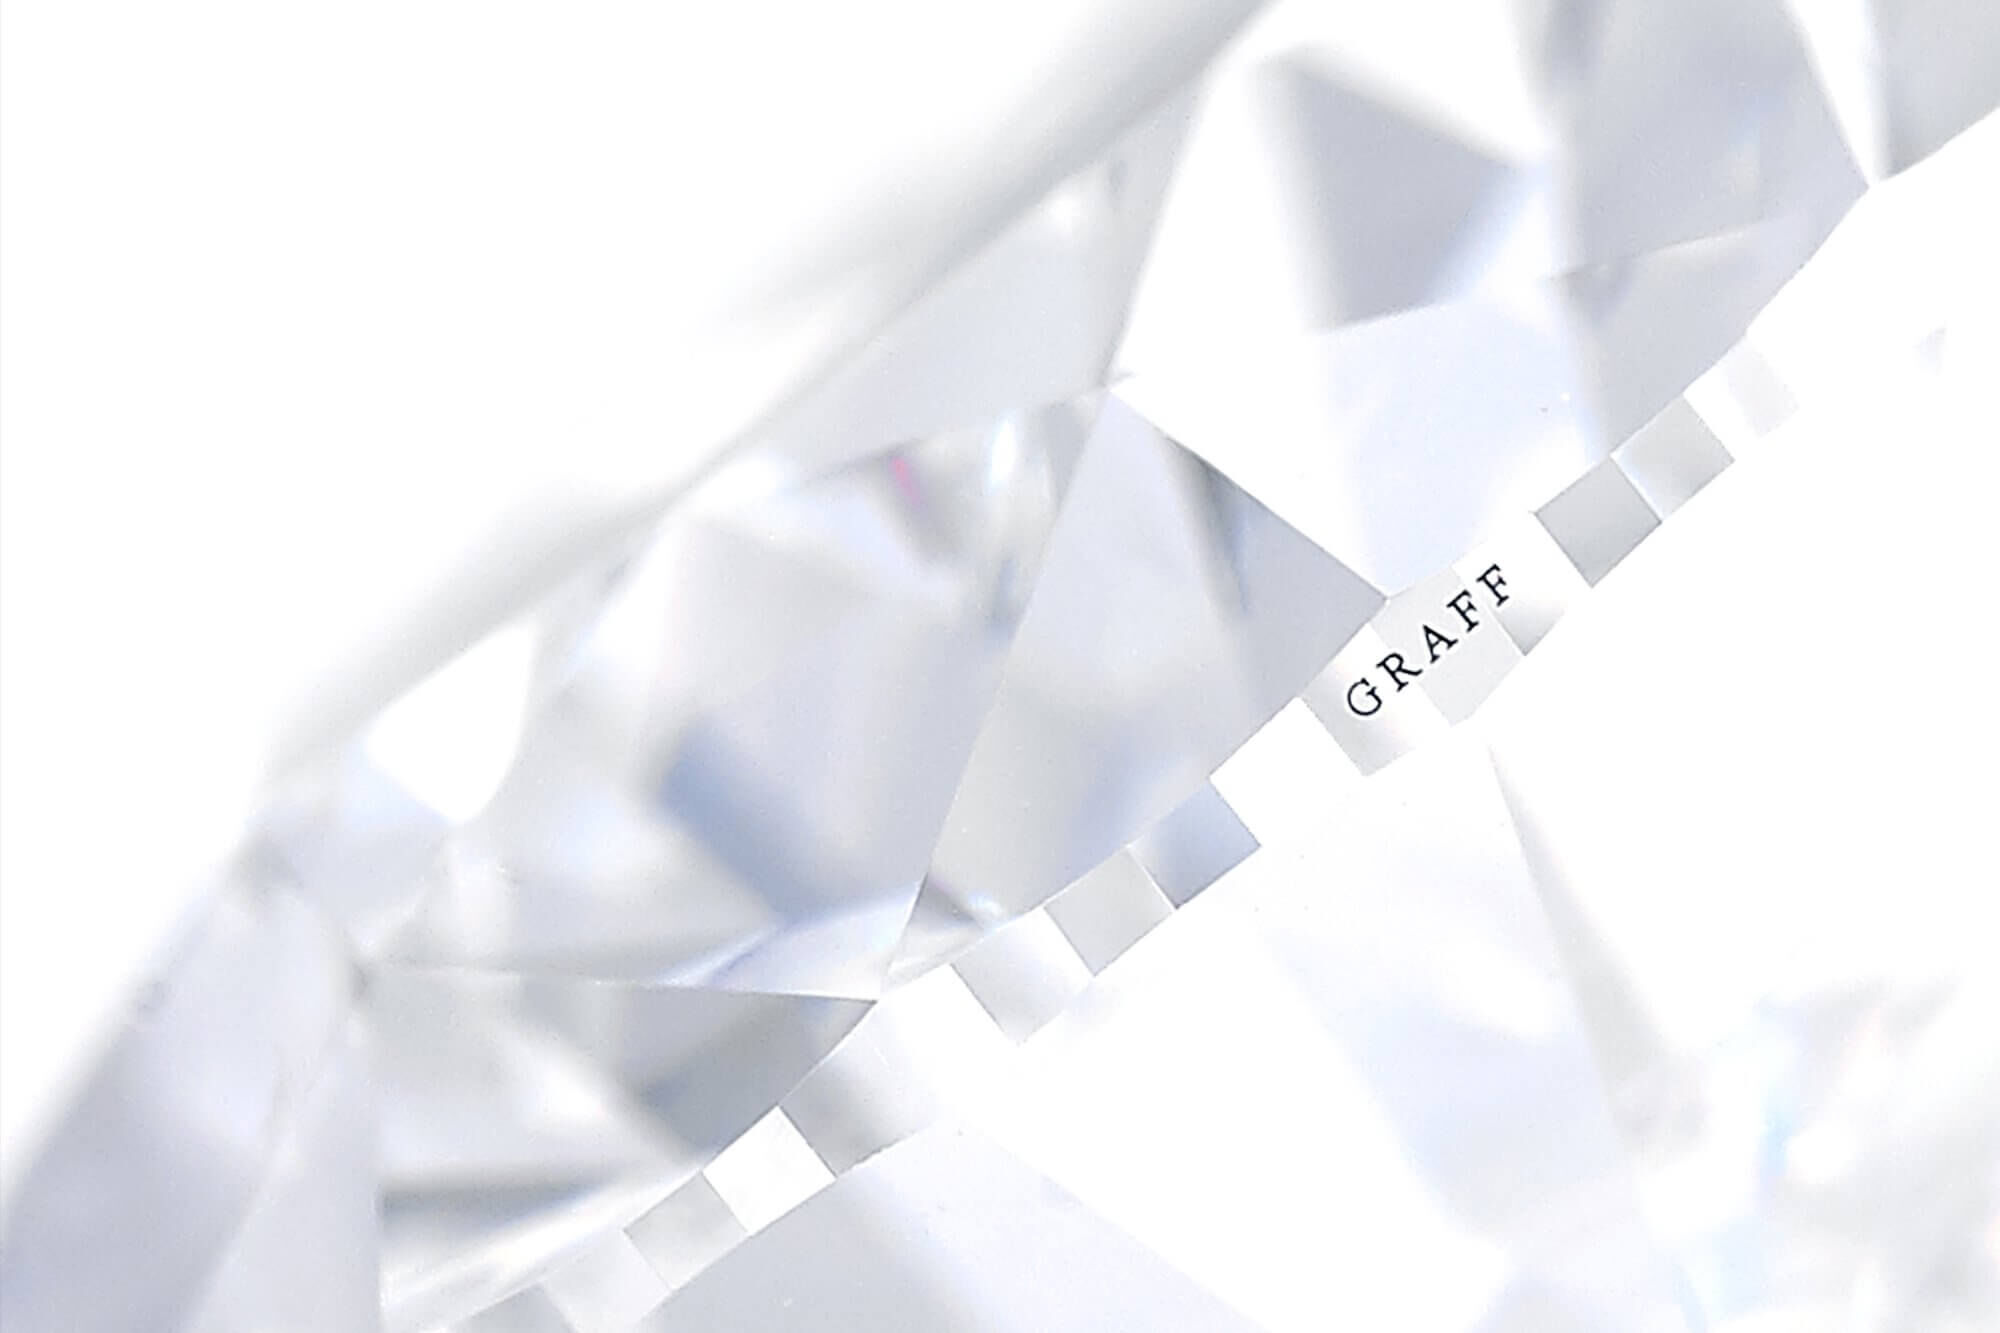 Graff Diamond engraved with Graff name